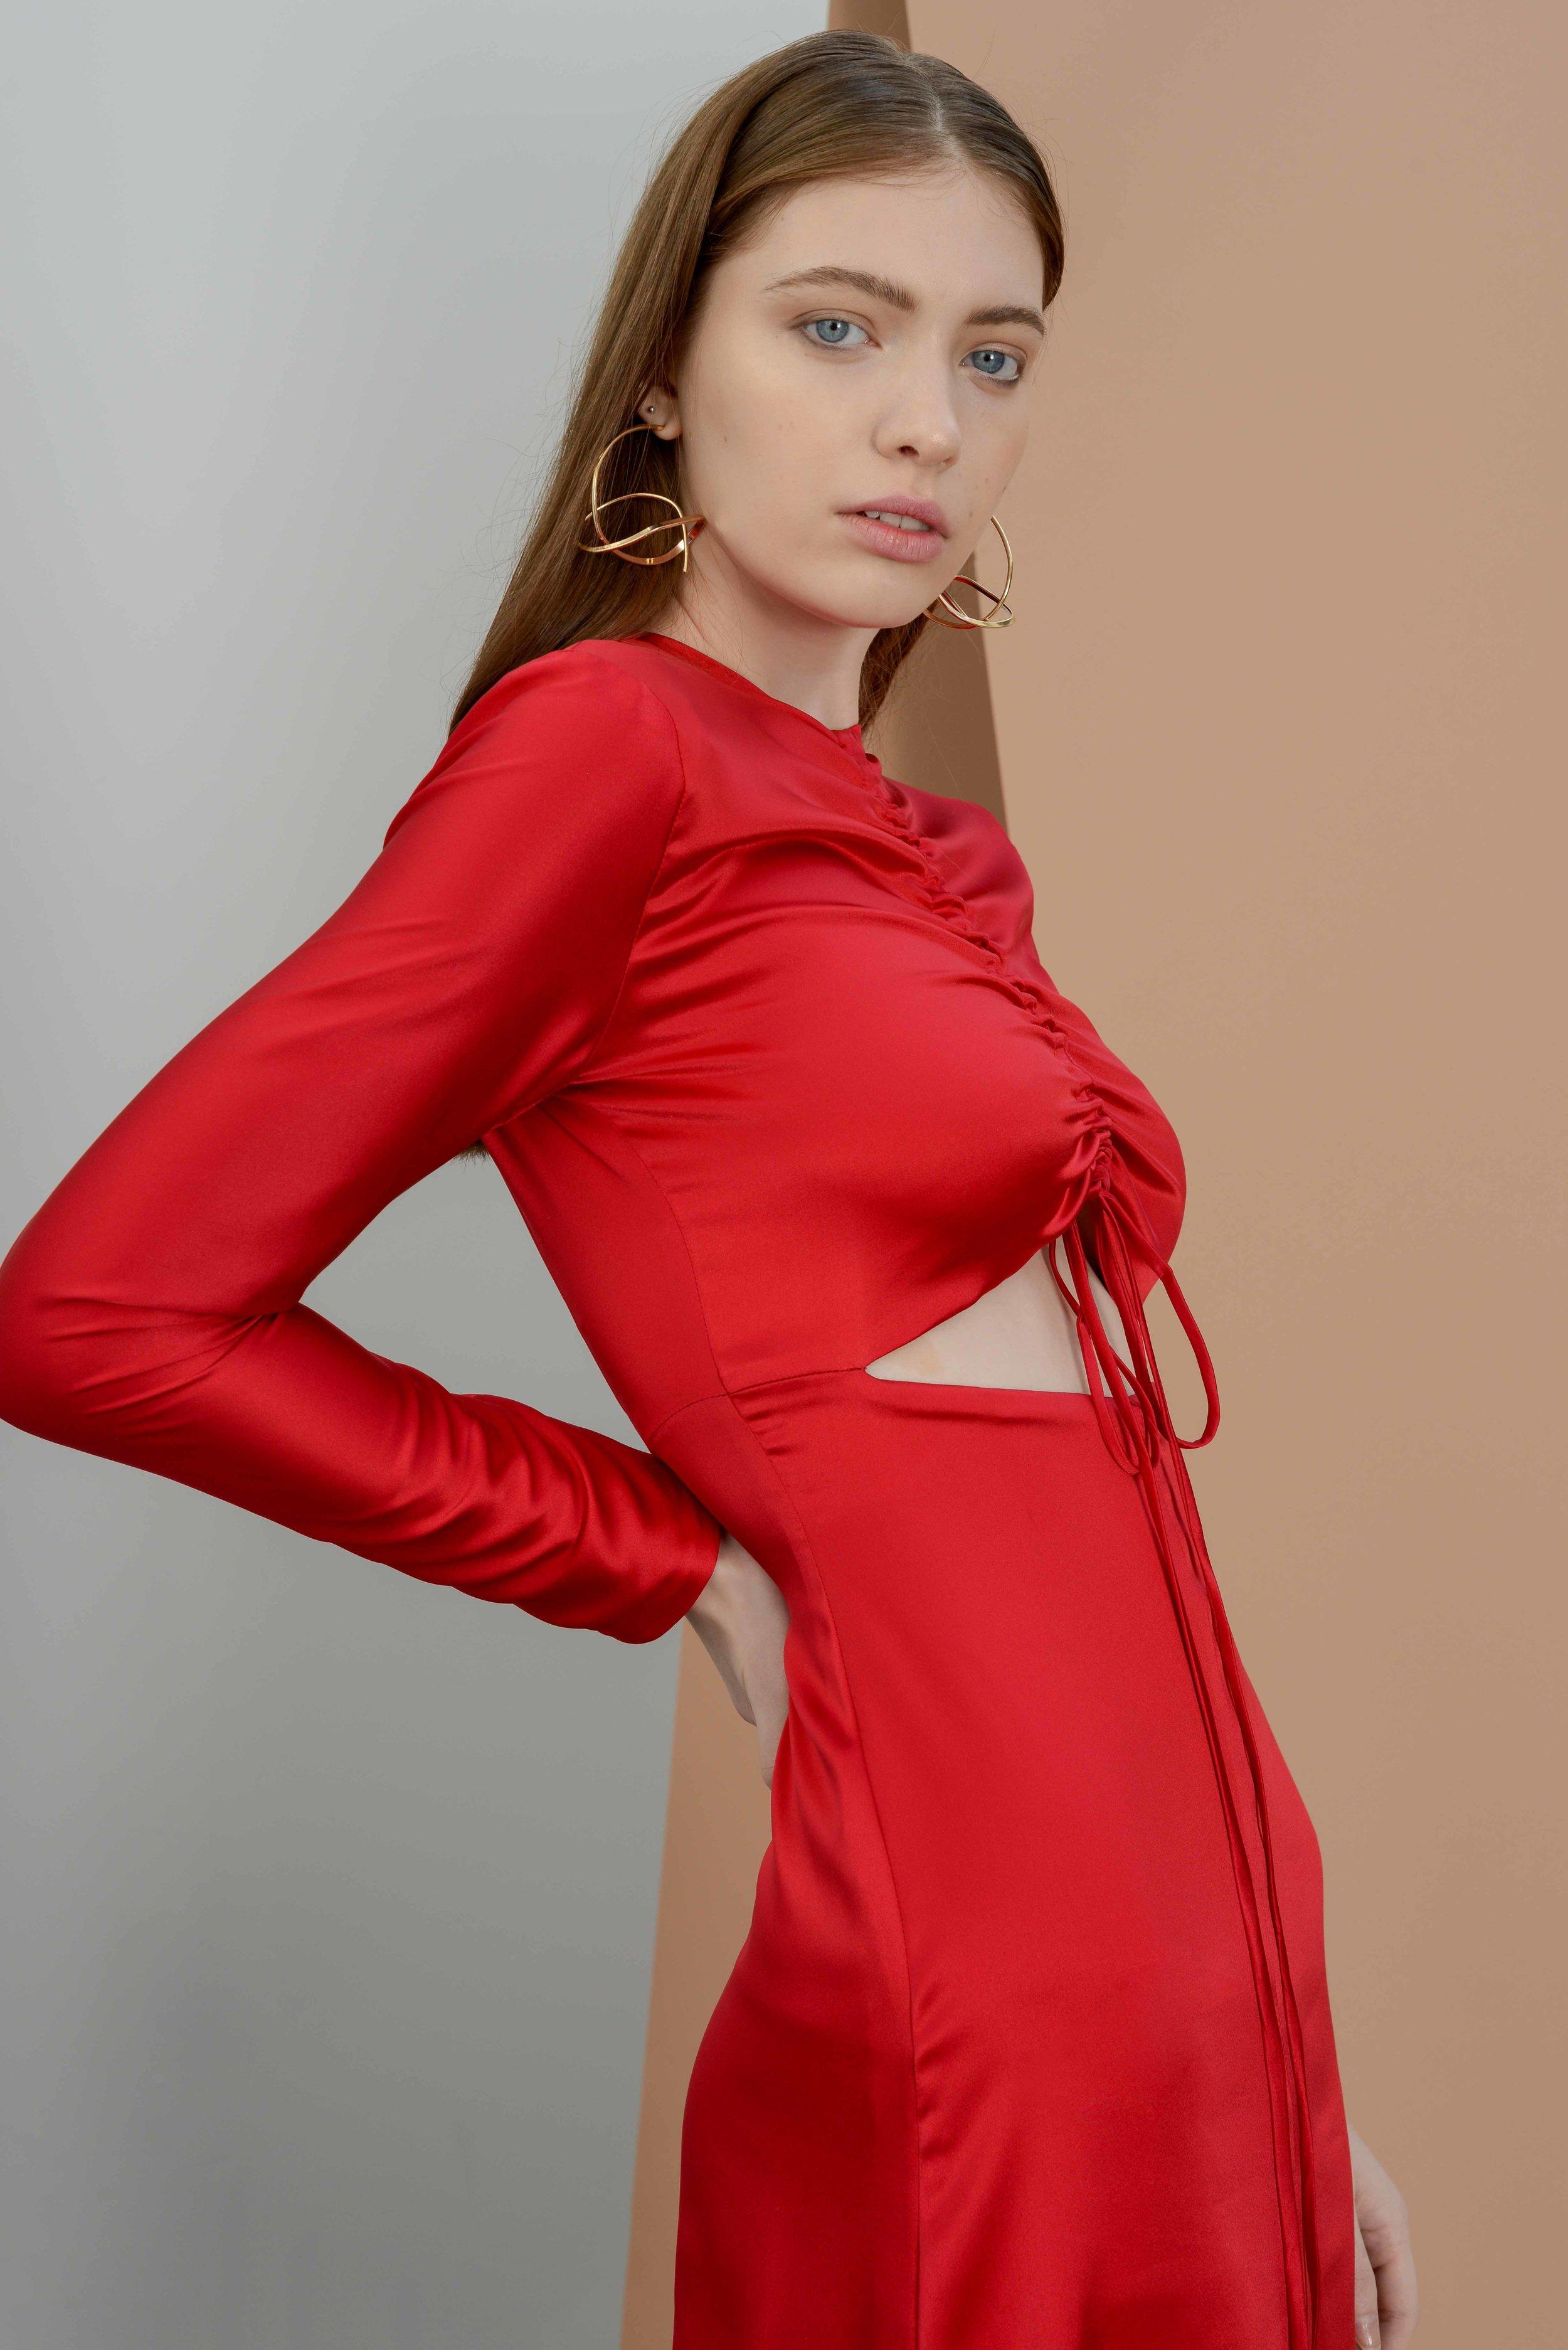 LIONPALM RED SILK DRESS Fashion Foundry.jpg